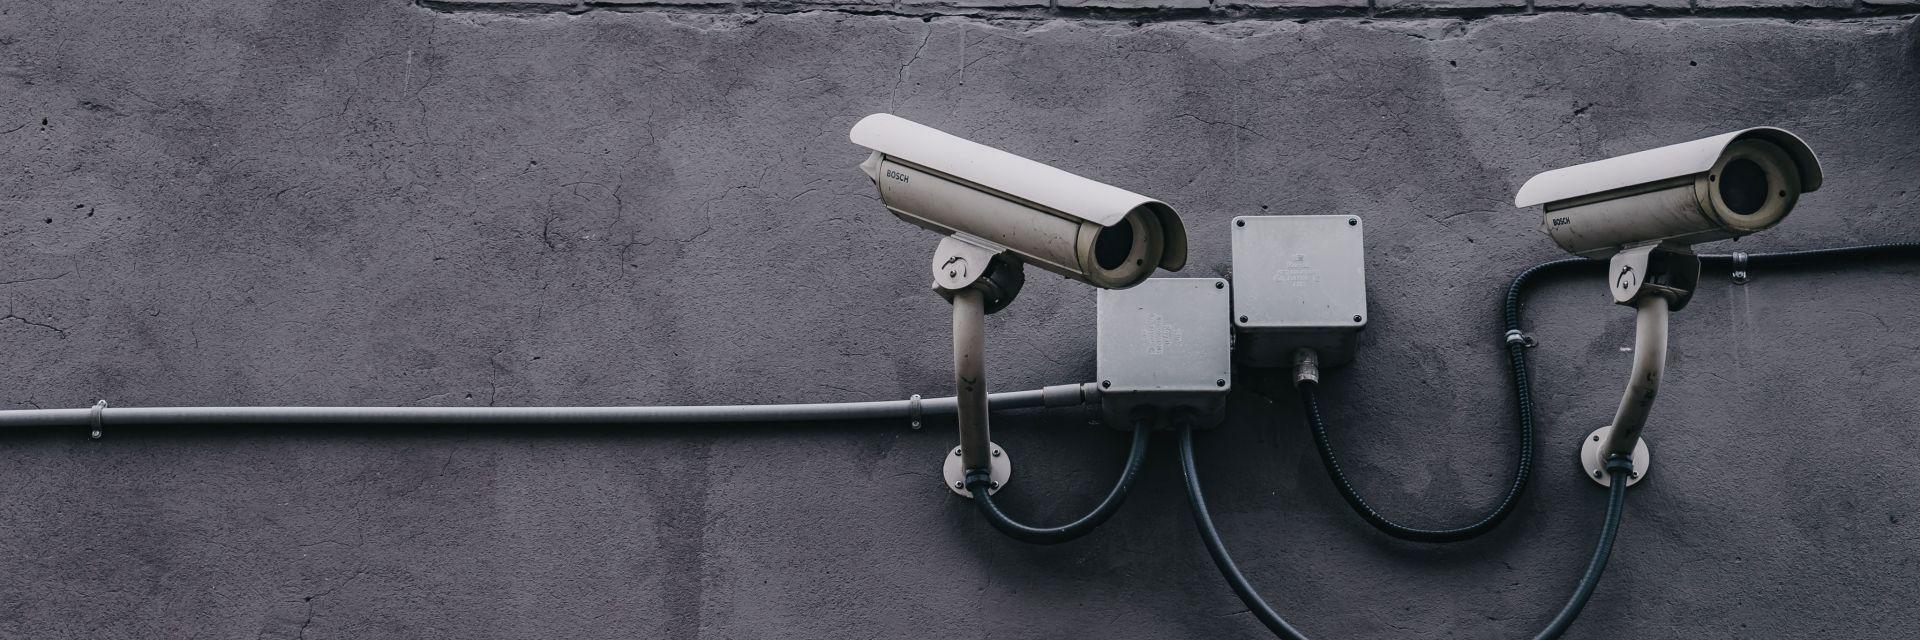 CCTV Page Lead